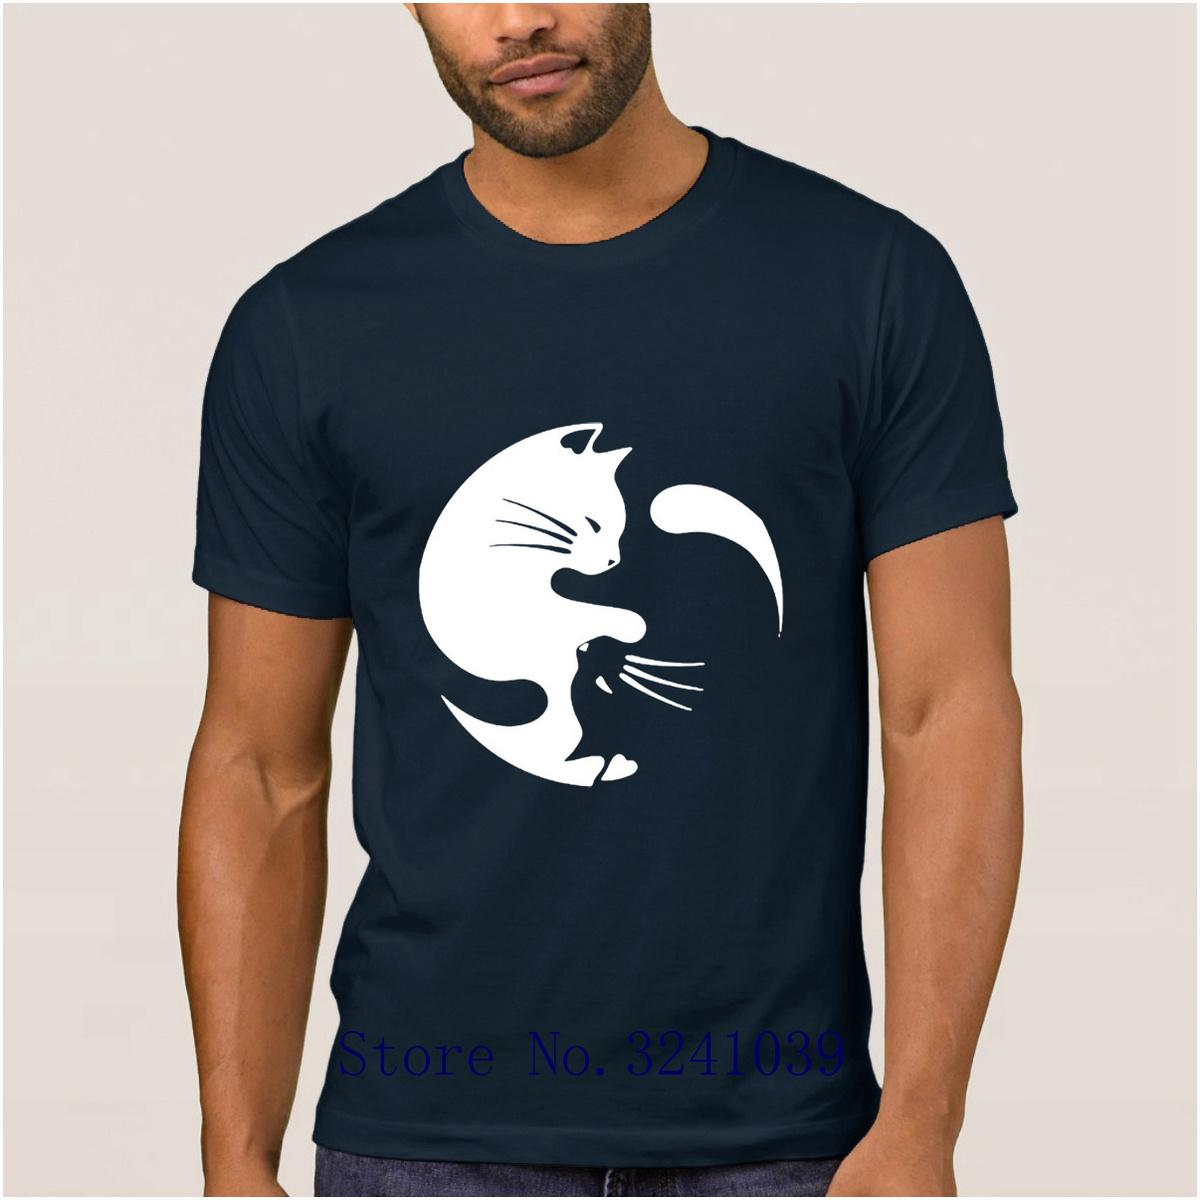 La Maxpa Print Humor Yin Yang Cats Fantastic t shirt for men Spring Graphic t-shirt mens Leisure regular tshirt for men